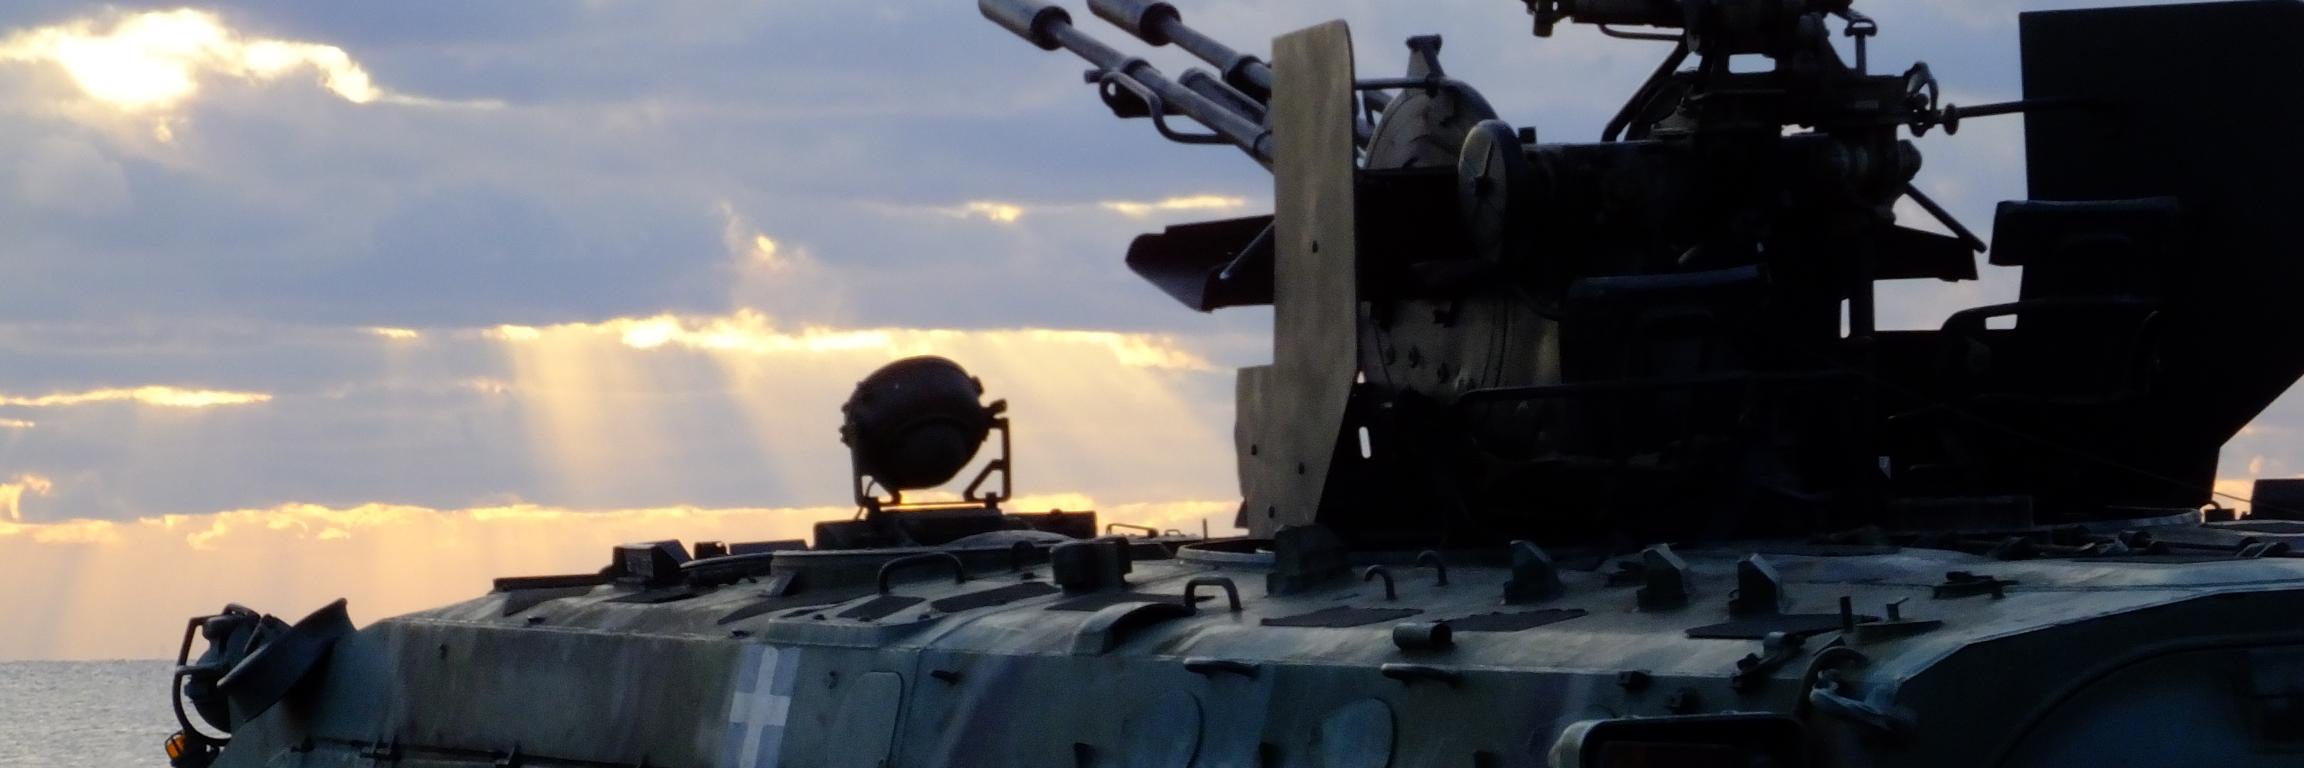 #HellenicNavy frigate S class silhouette spotted outside #Psara island in #Aegean Sea Famous Black Ridge -Mavri Rah… https://t.co/mGhqDnl4U8